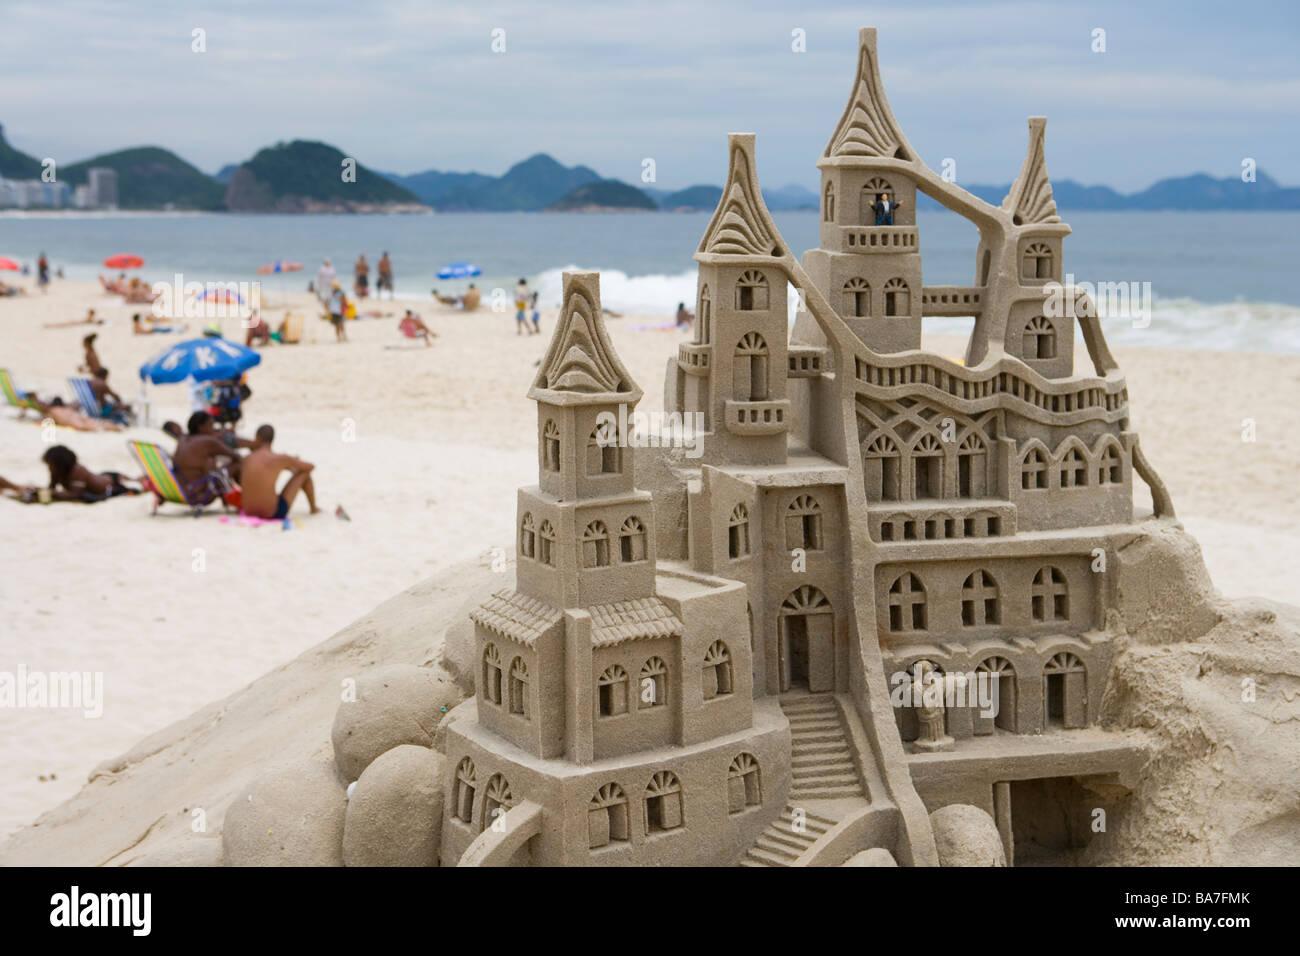 Building Sand Castles : Building sand castles with nativity scene on copacabana